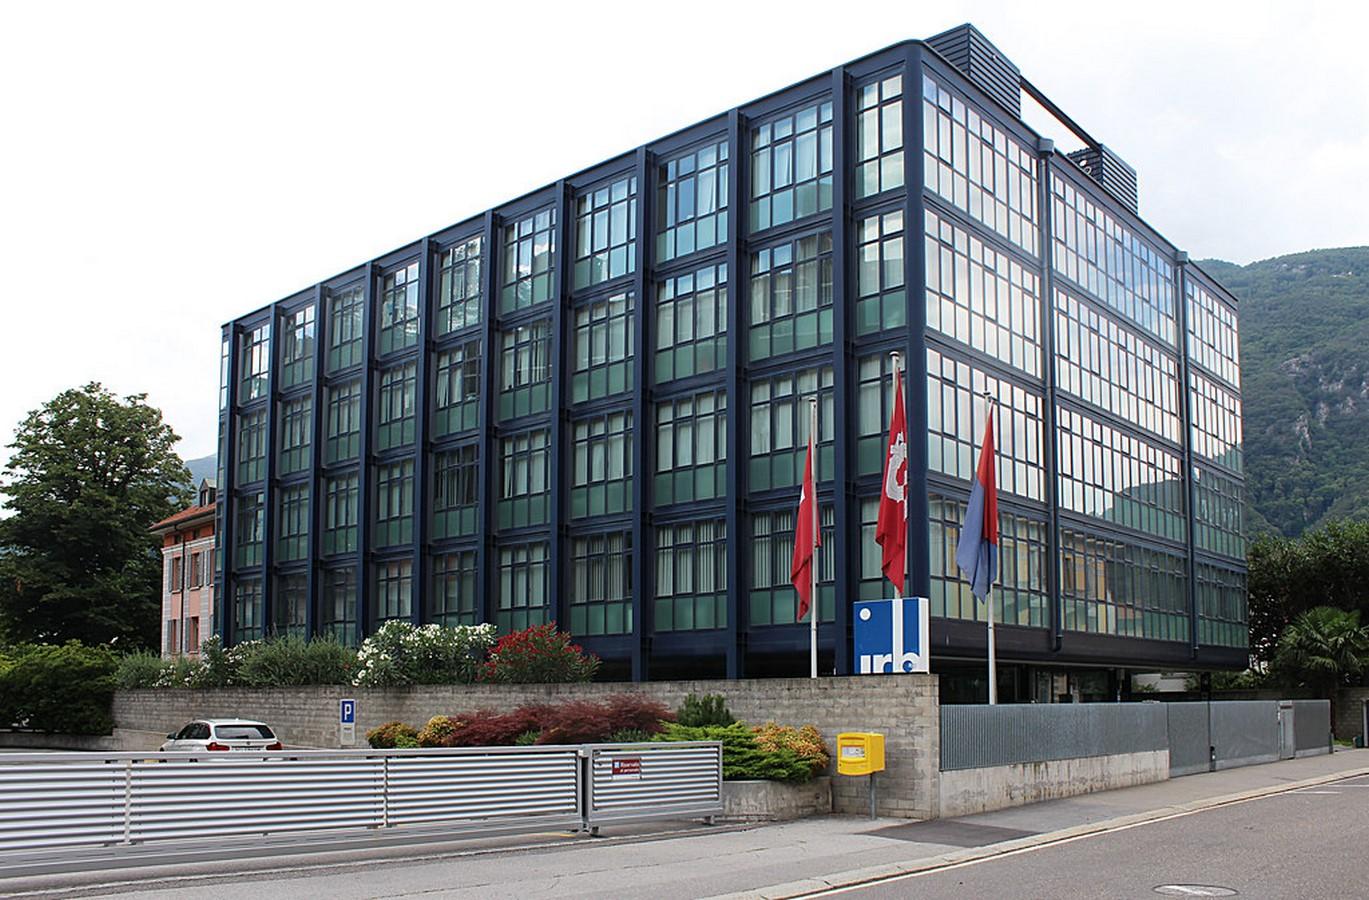 Fabrizia administration building - Sheet1